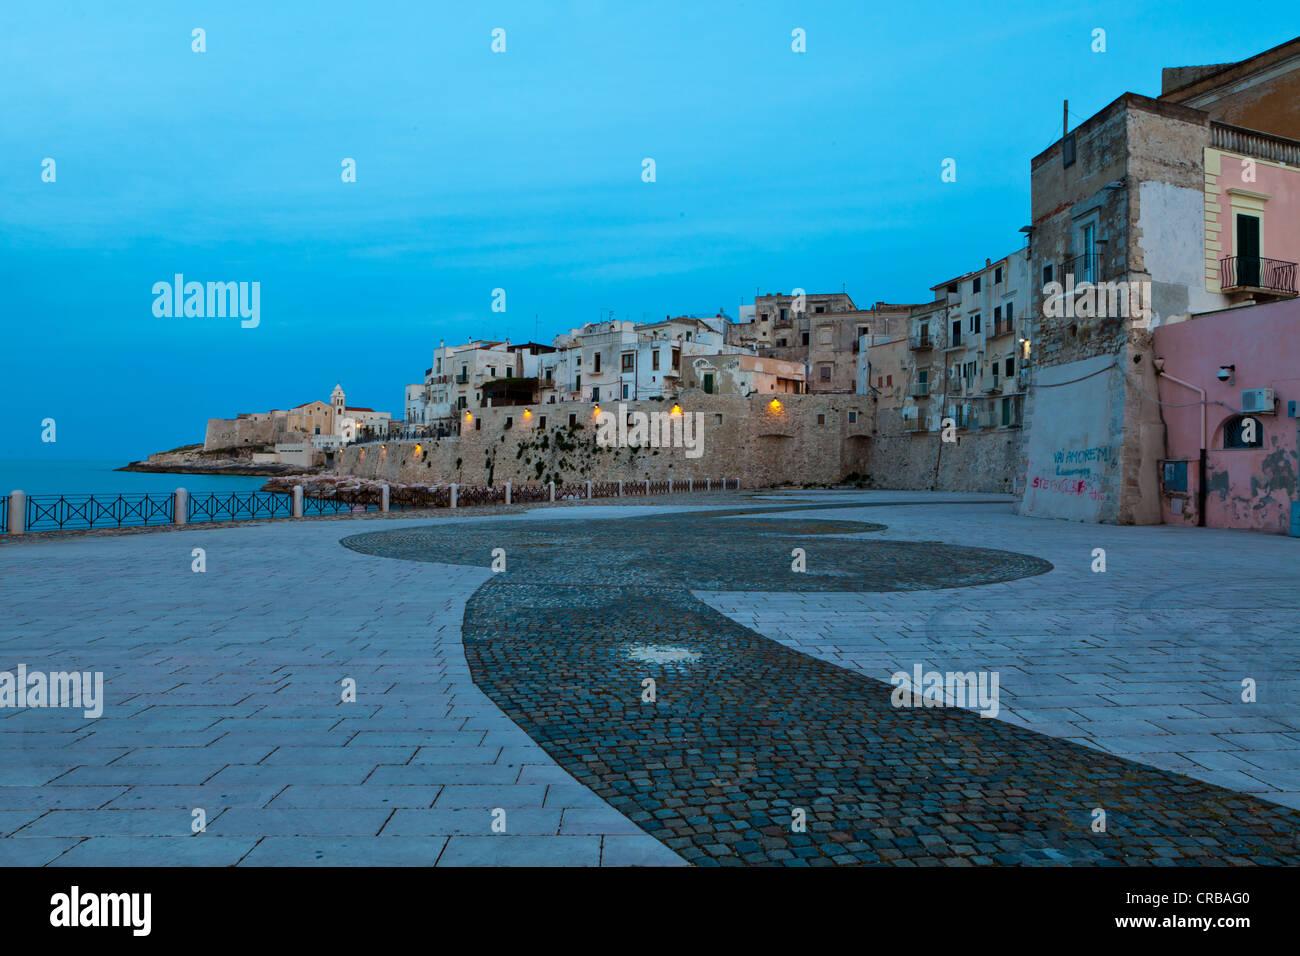 Giardino Pubblico Marina Piccola, public garden, at dusk, Vieste, Apulia, Puglia, Gargano, Adria, Italy, Europe - Stock Image